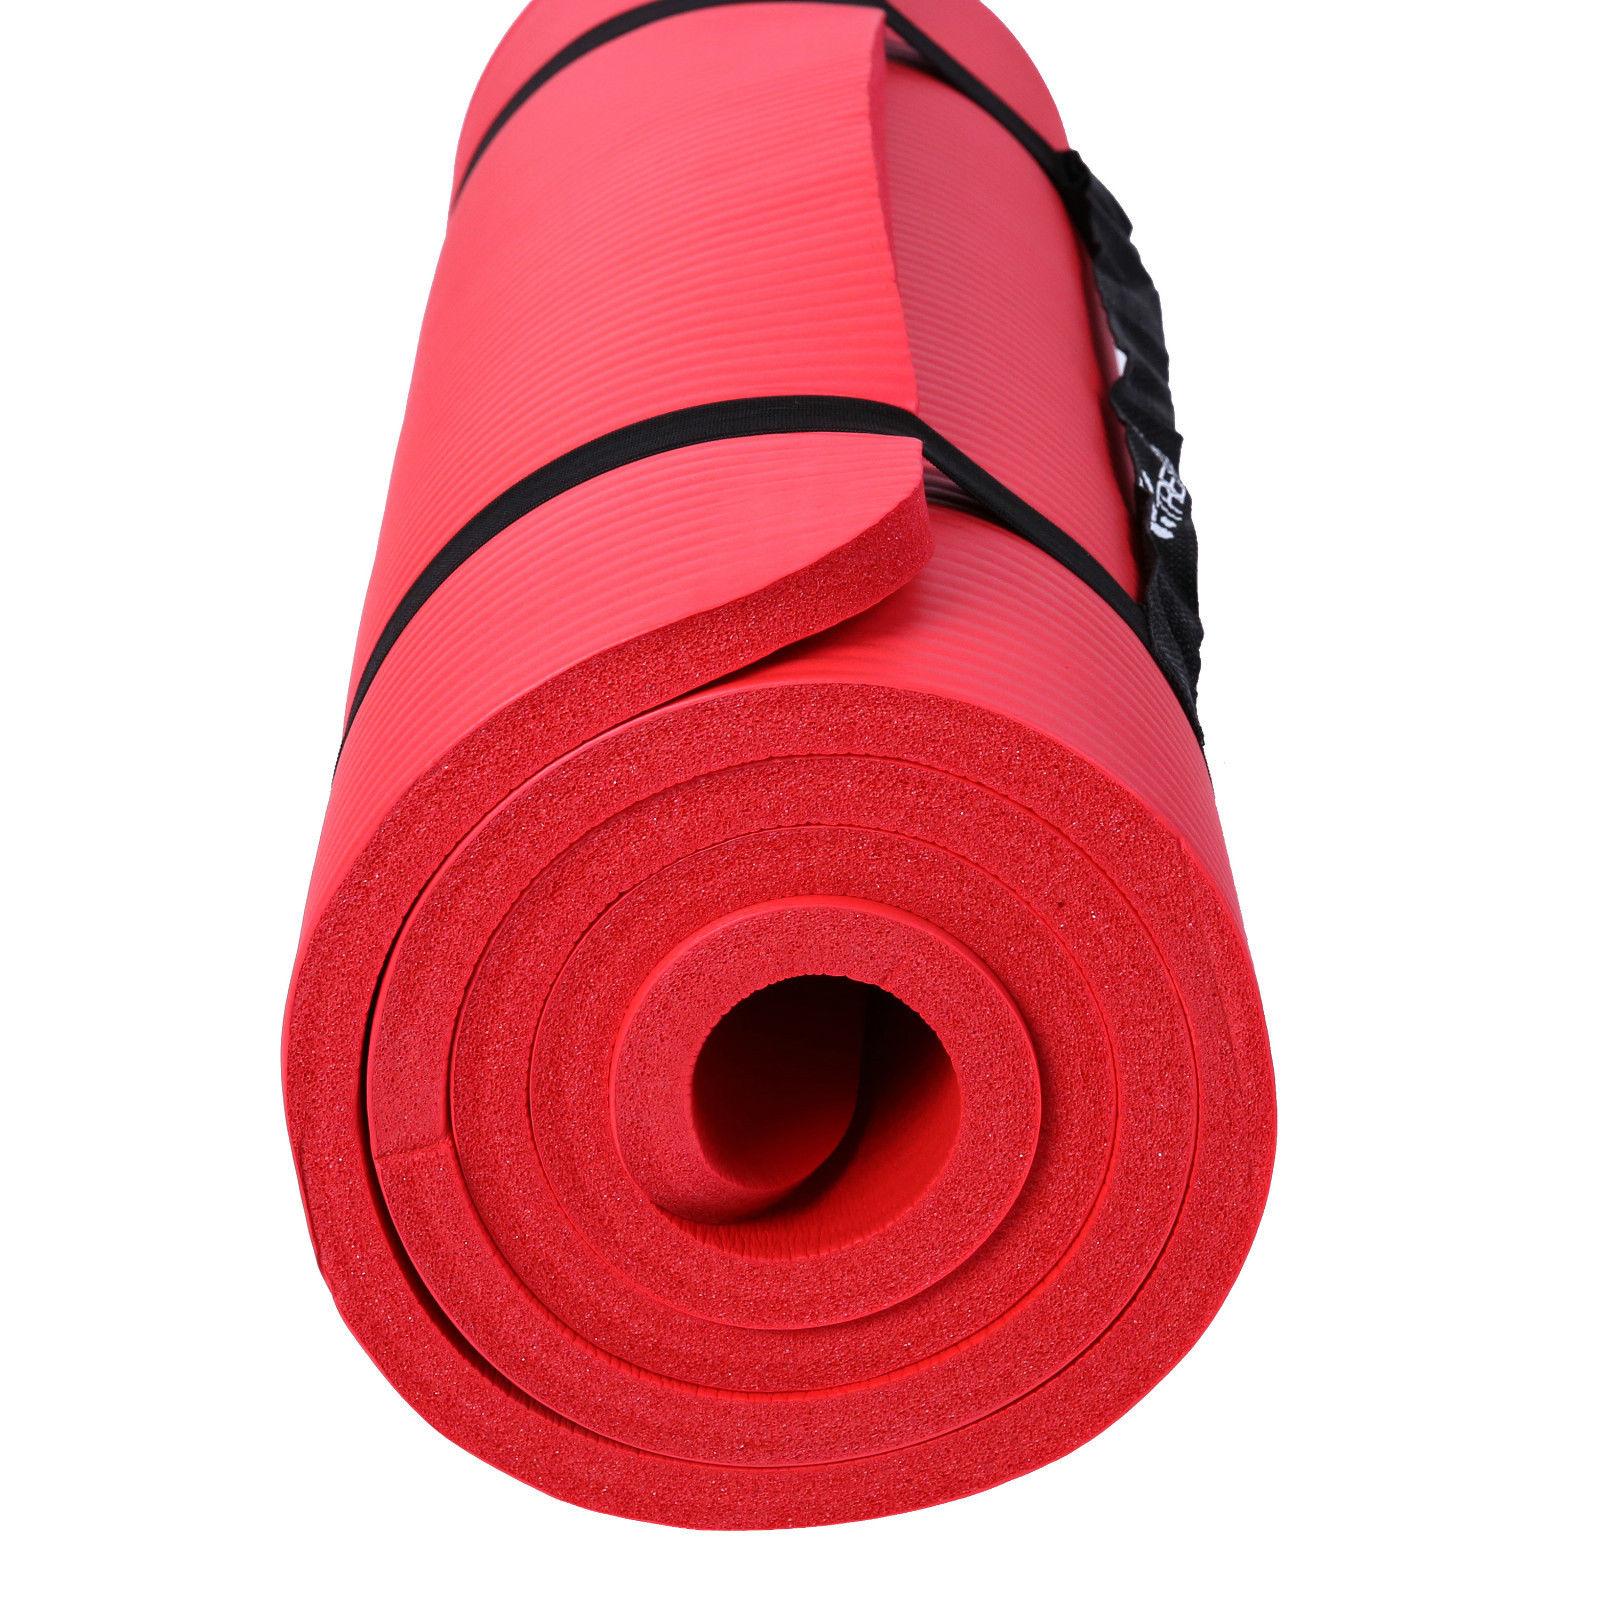 Yogamatte-Fitnessmatte-Gymnastikmatte-Pilates-Sportmatte-Bodenmatte-PHTHALATFREI Indexbild 23